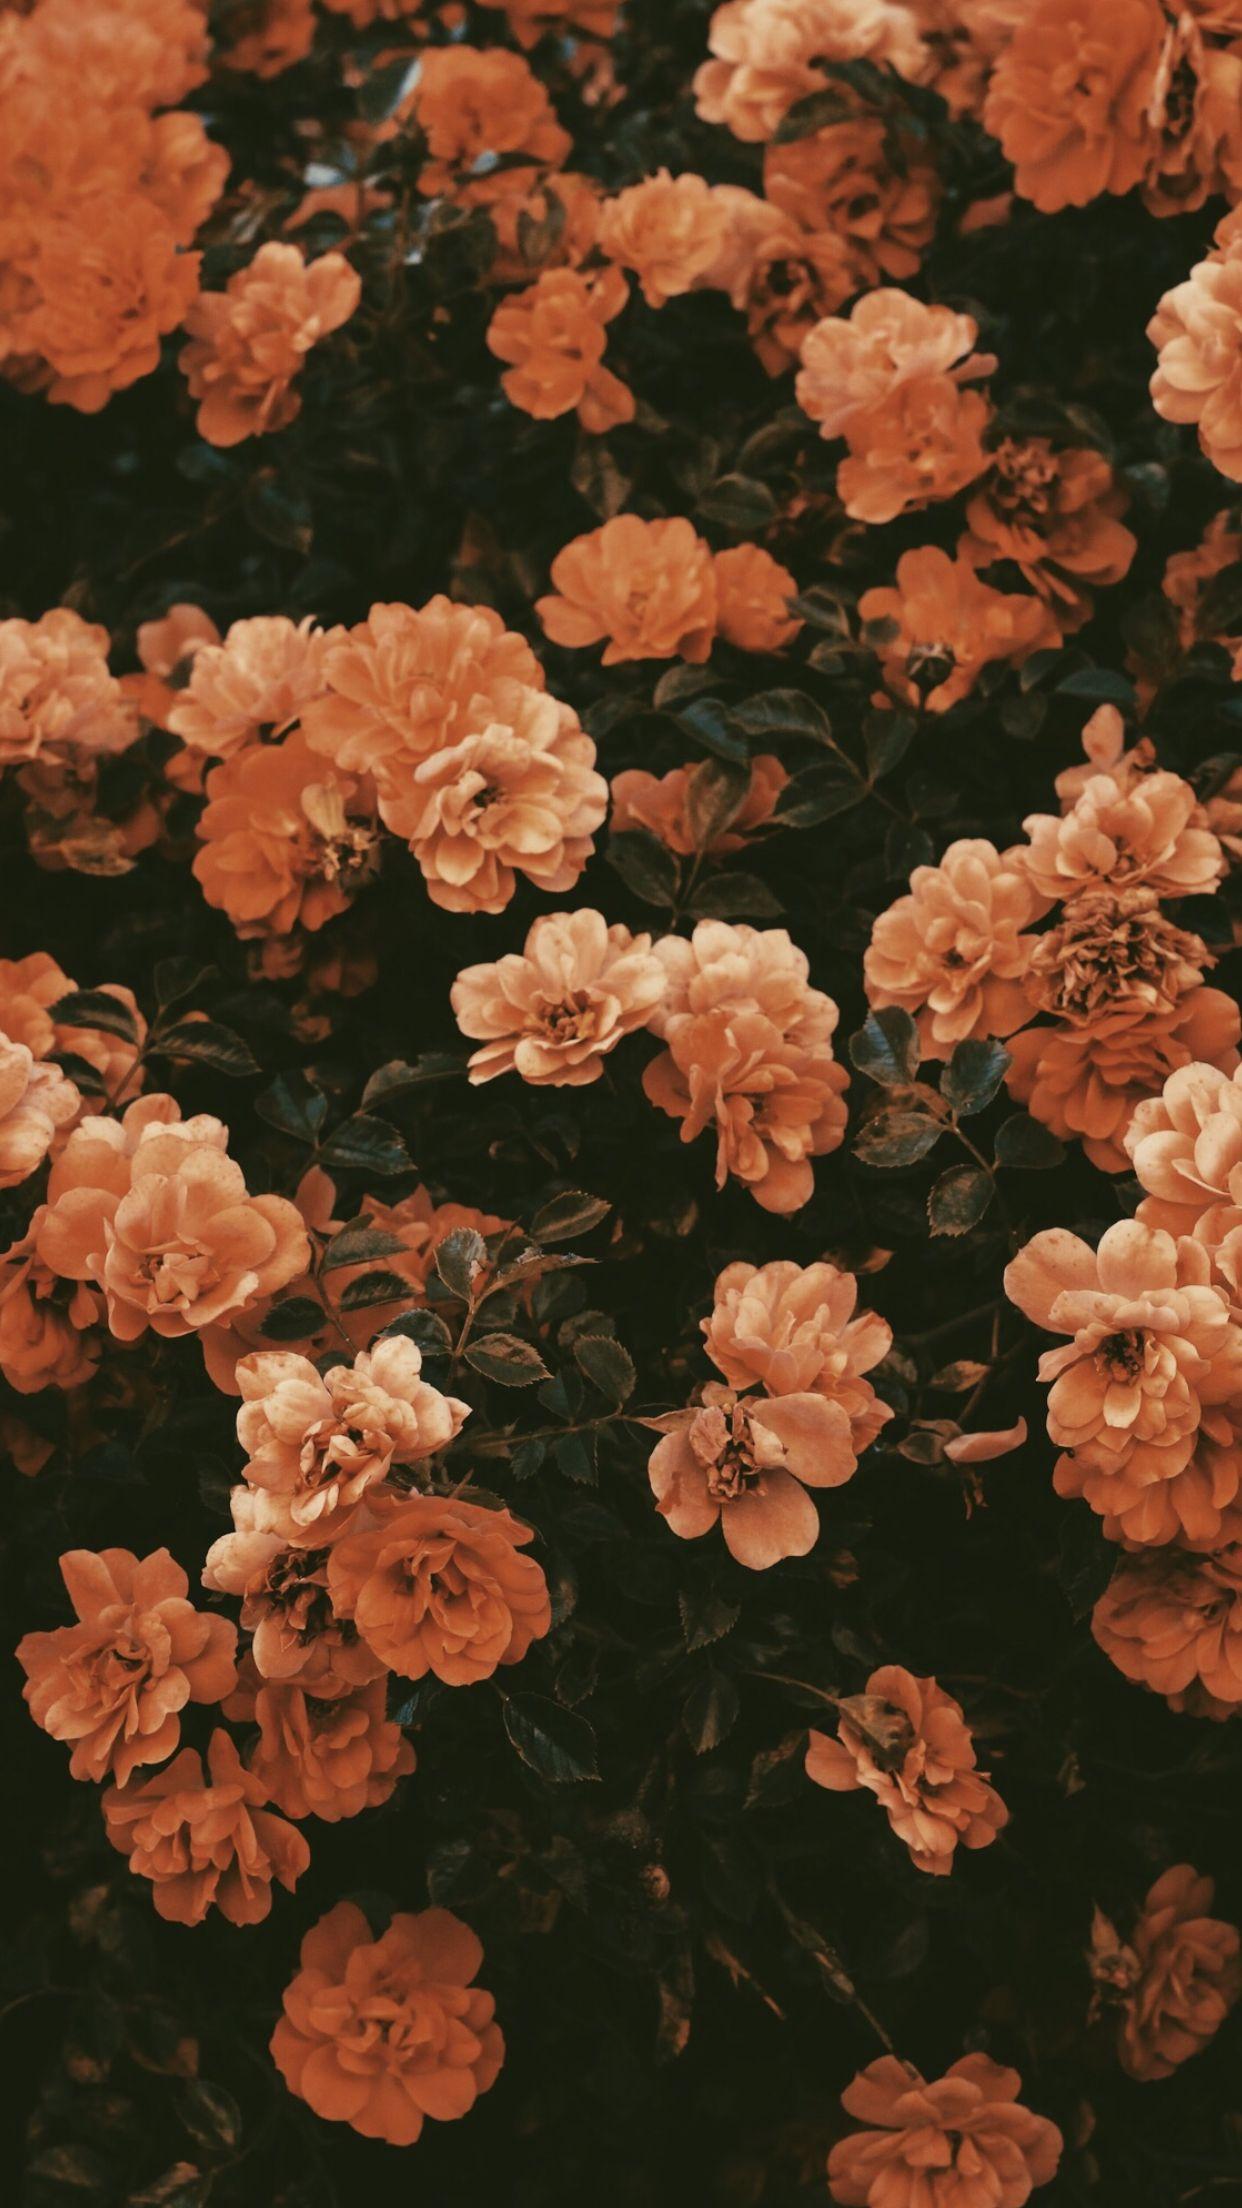 Fall Flowers Vintage Flower Backgrounds Flower Background Iphone Flower Iphone Wallpaper